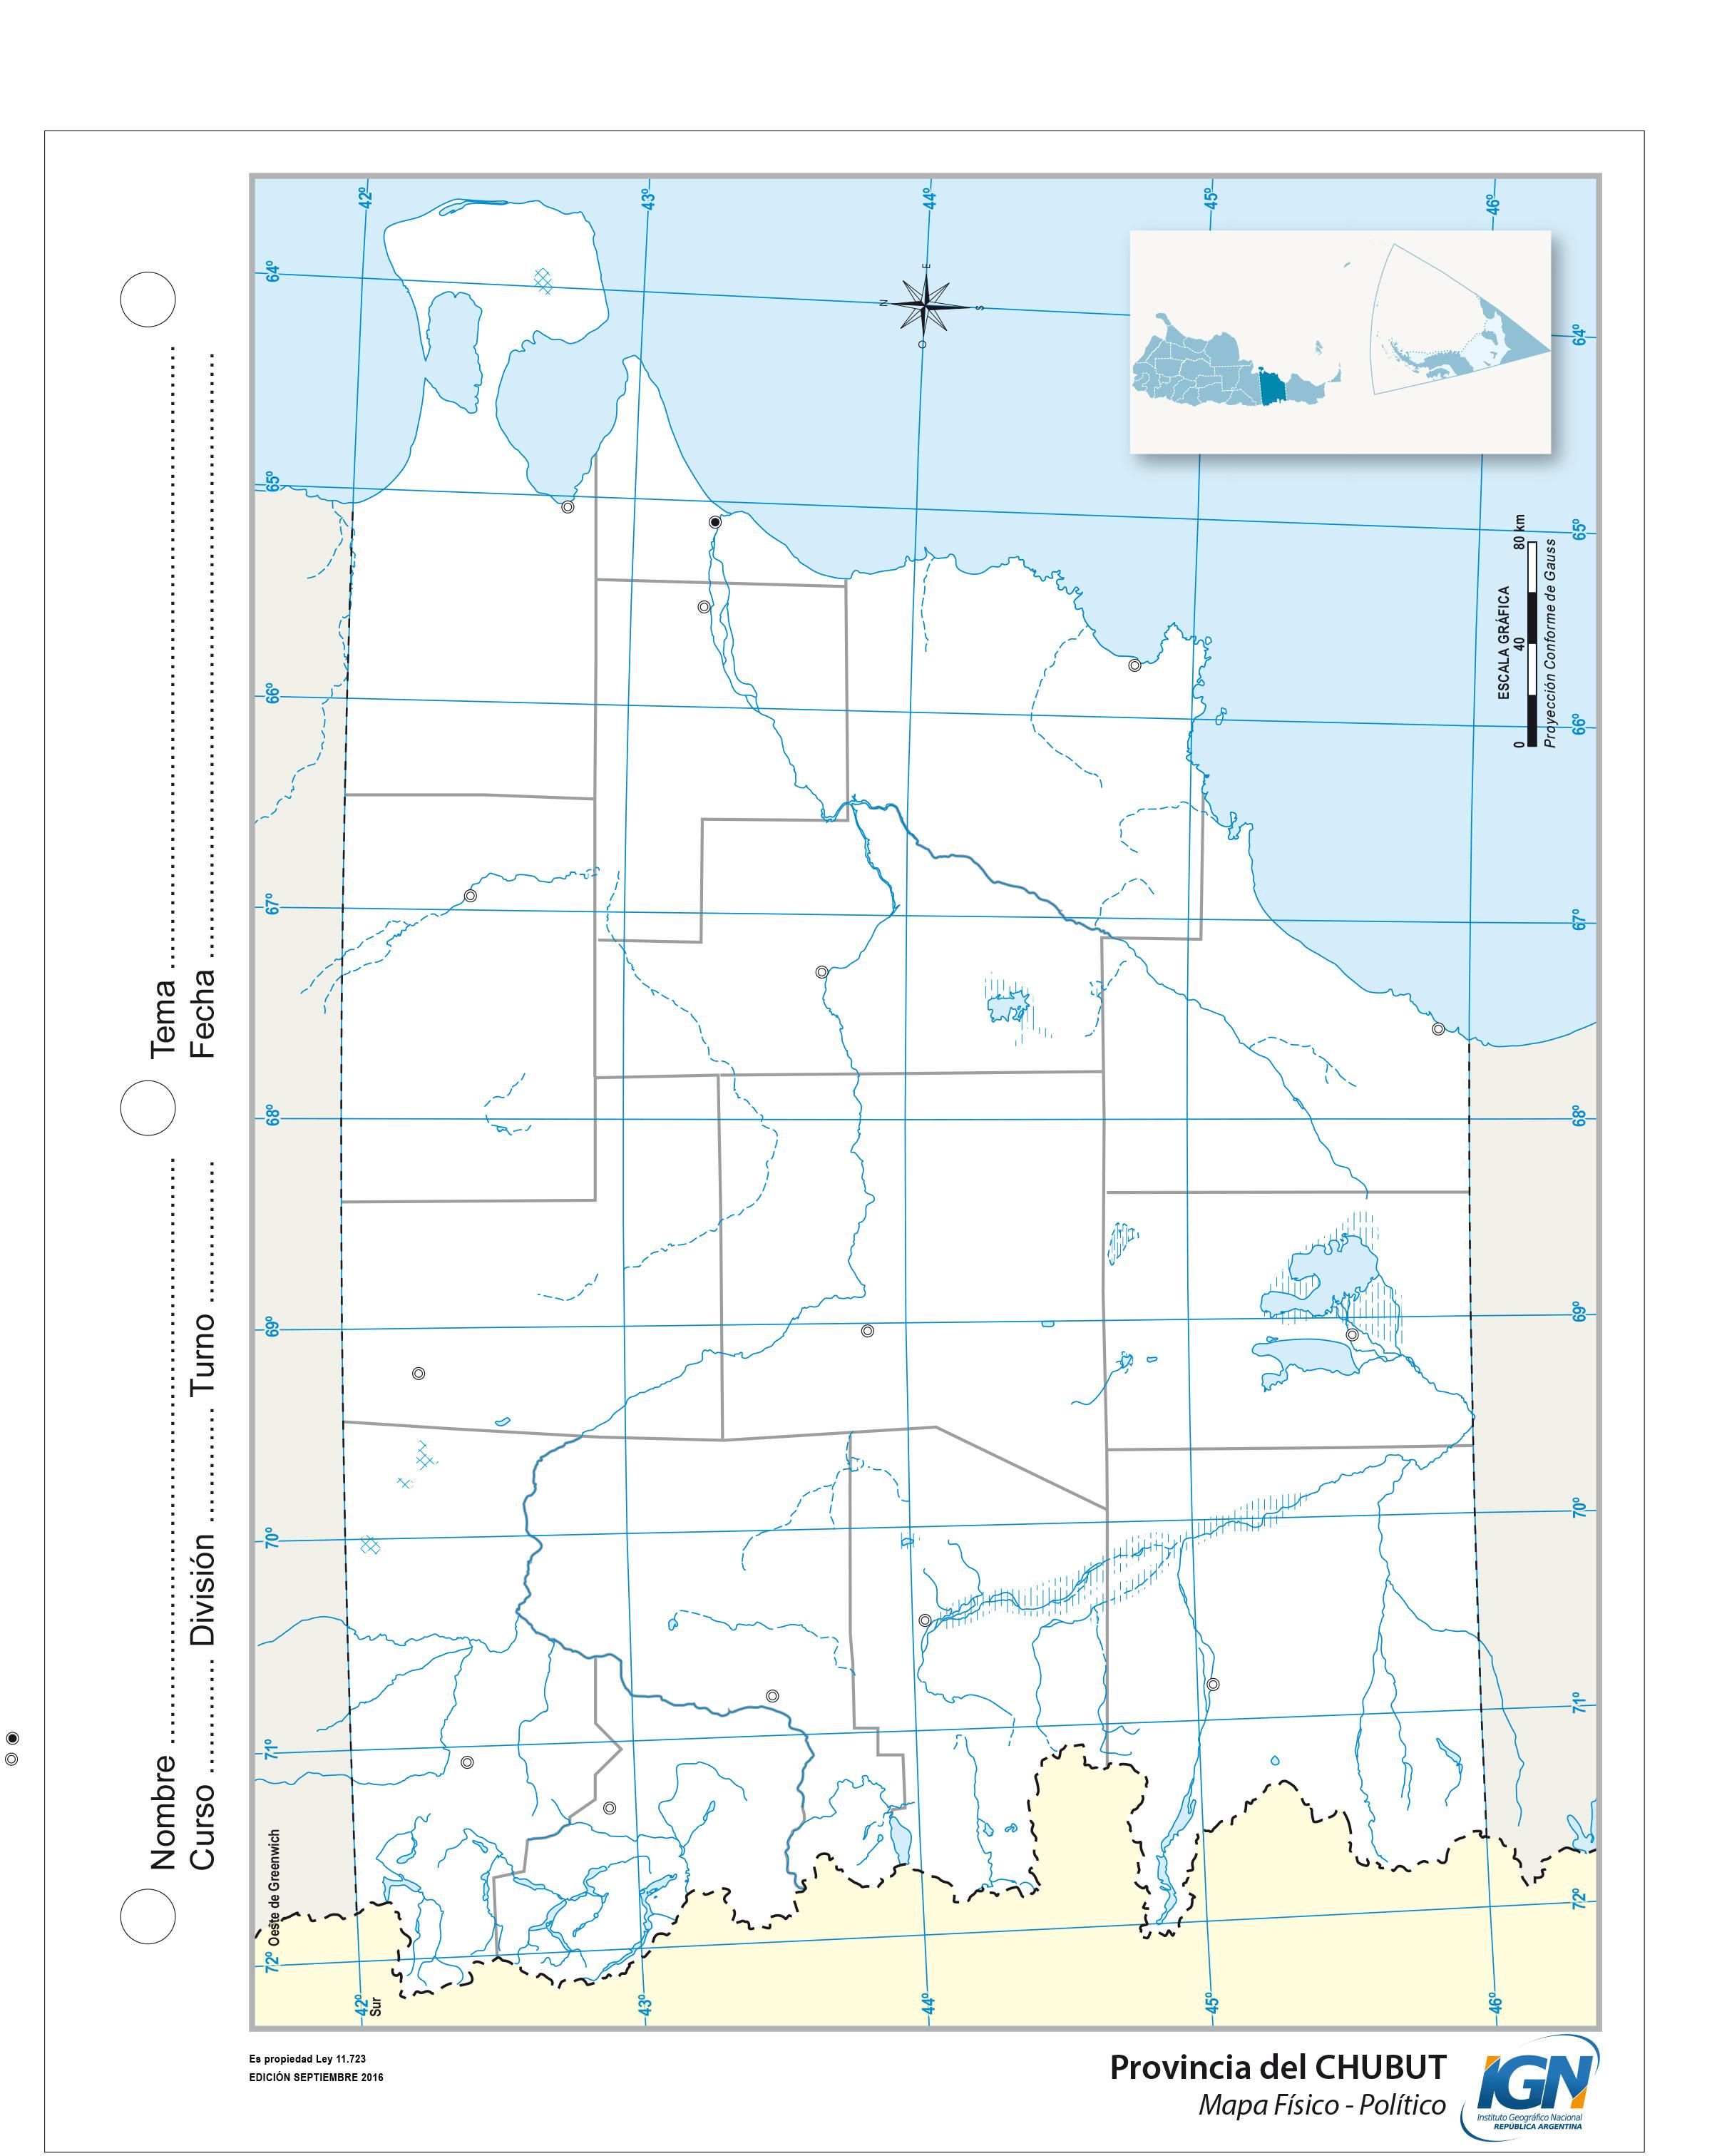 Mapas escolares | Instituto Geográfico Nacional